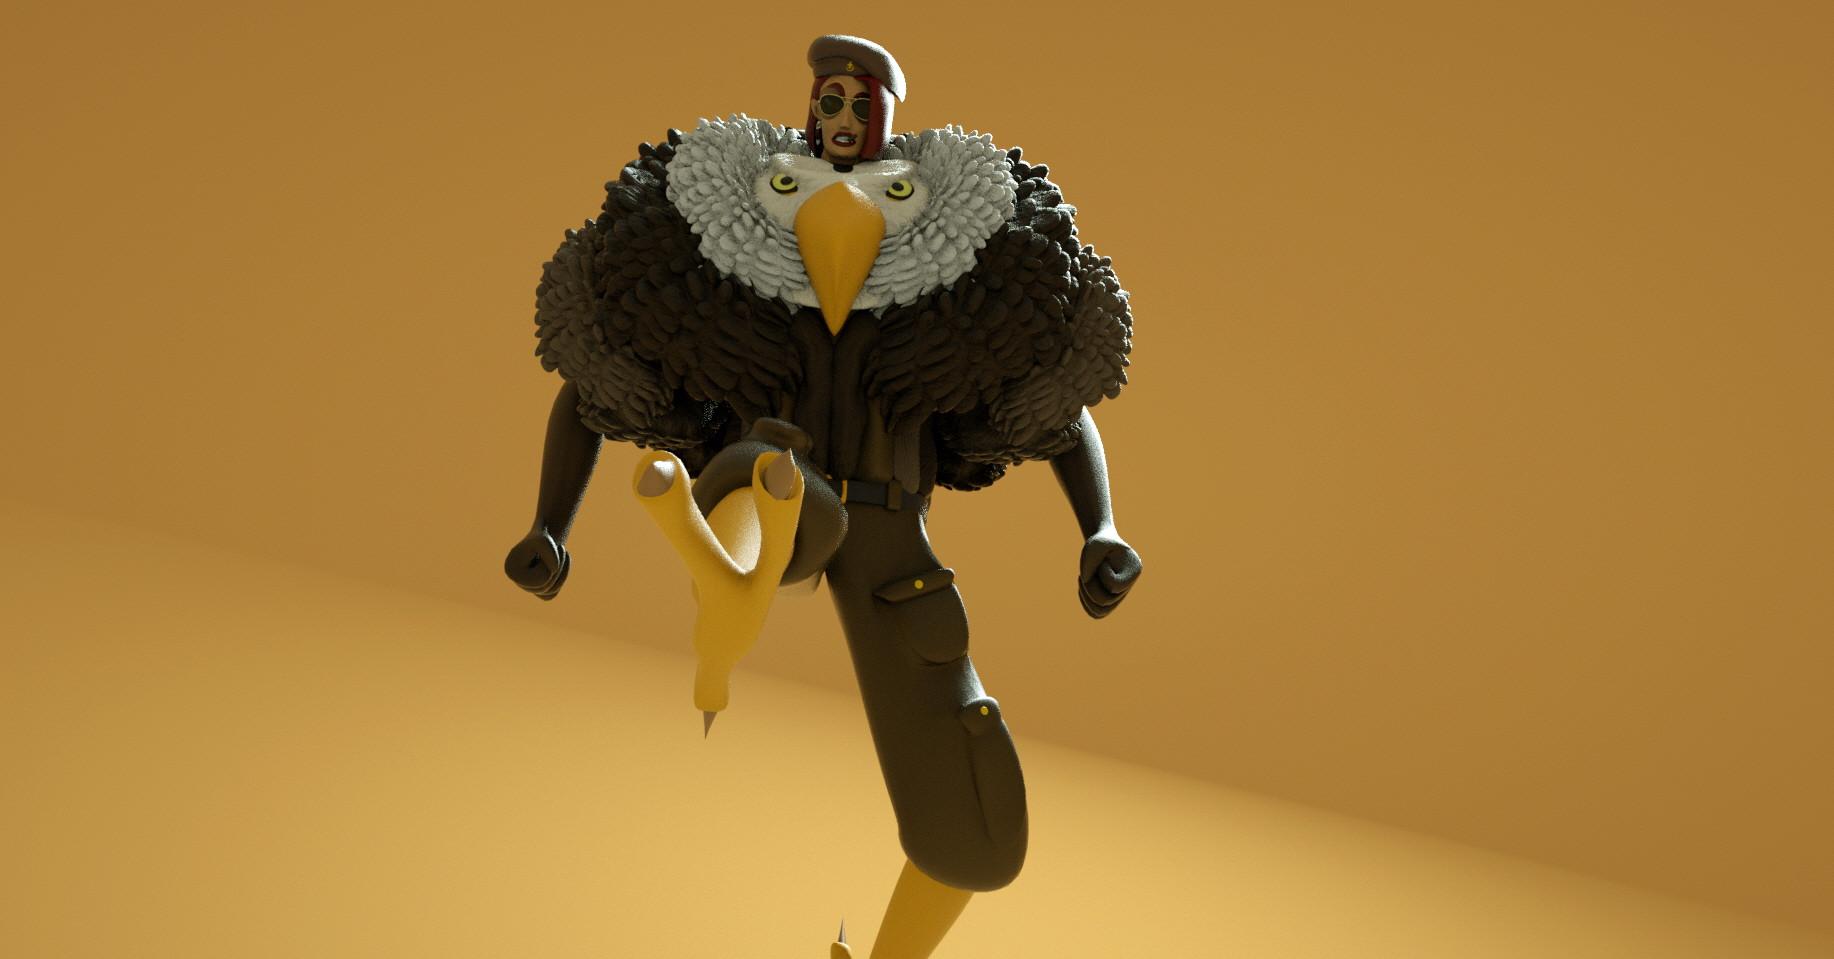 Eagle20.jpg